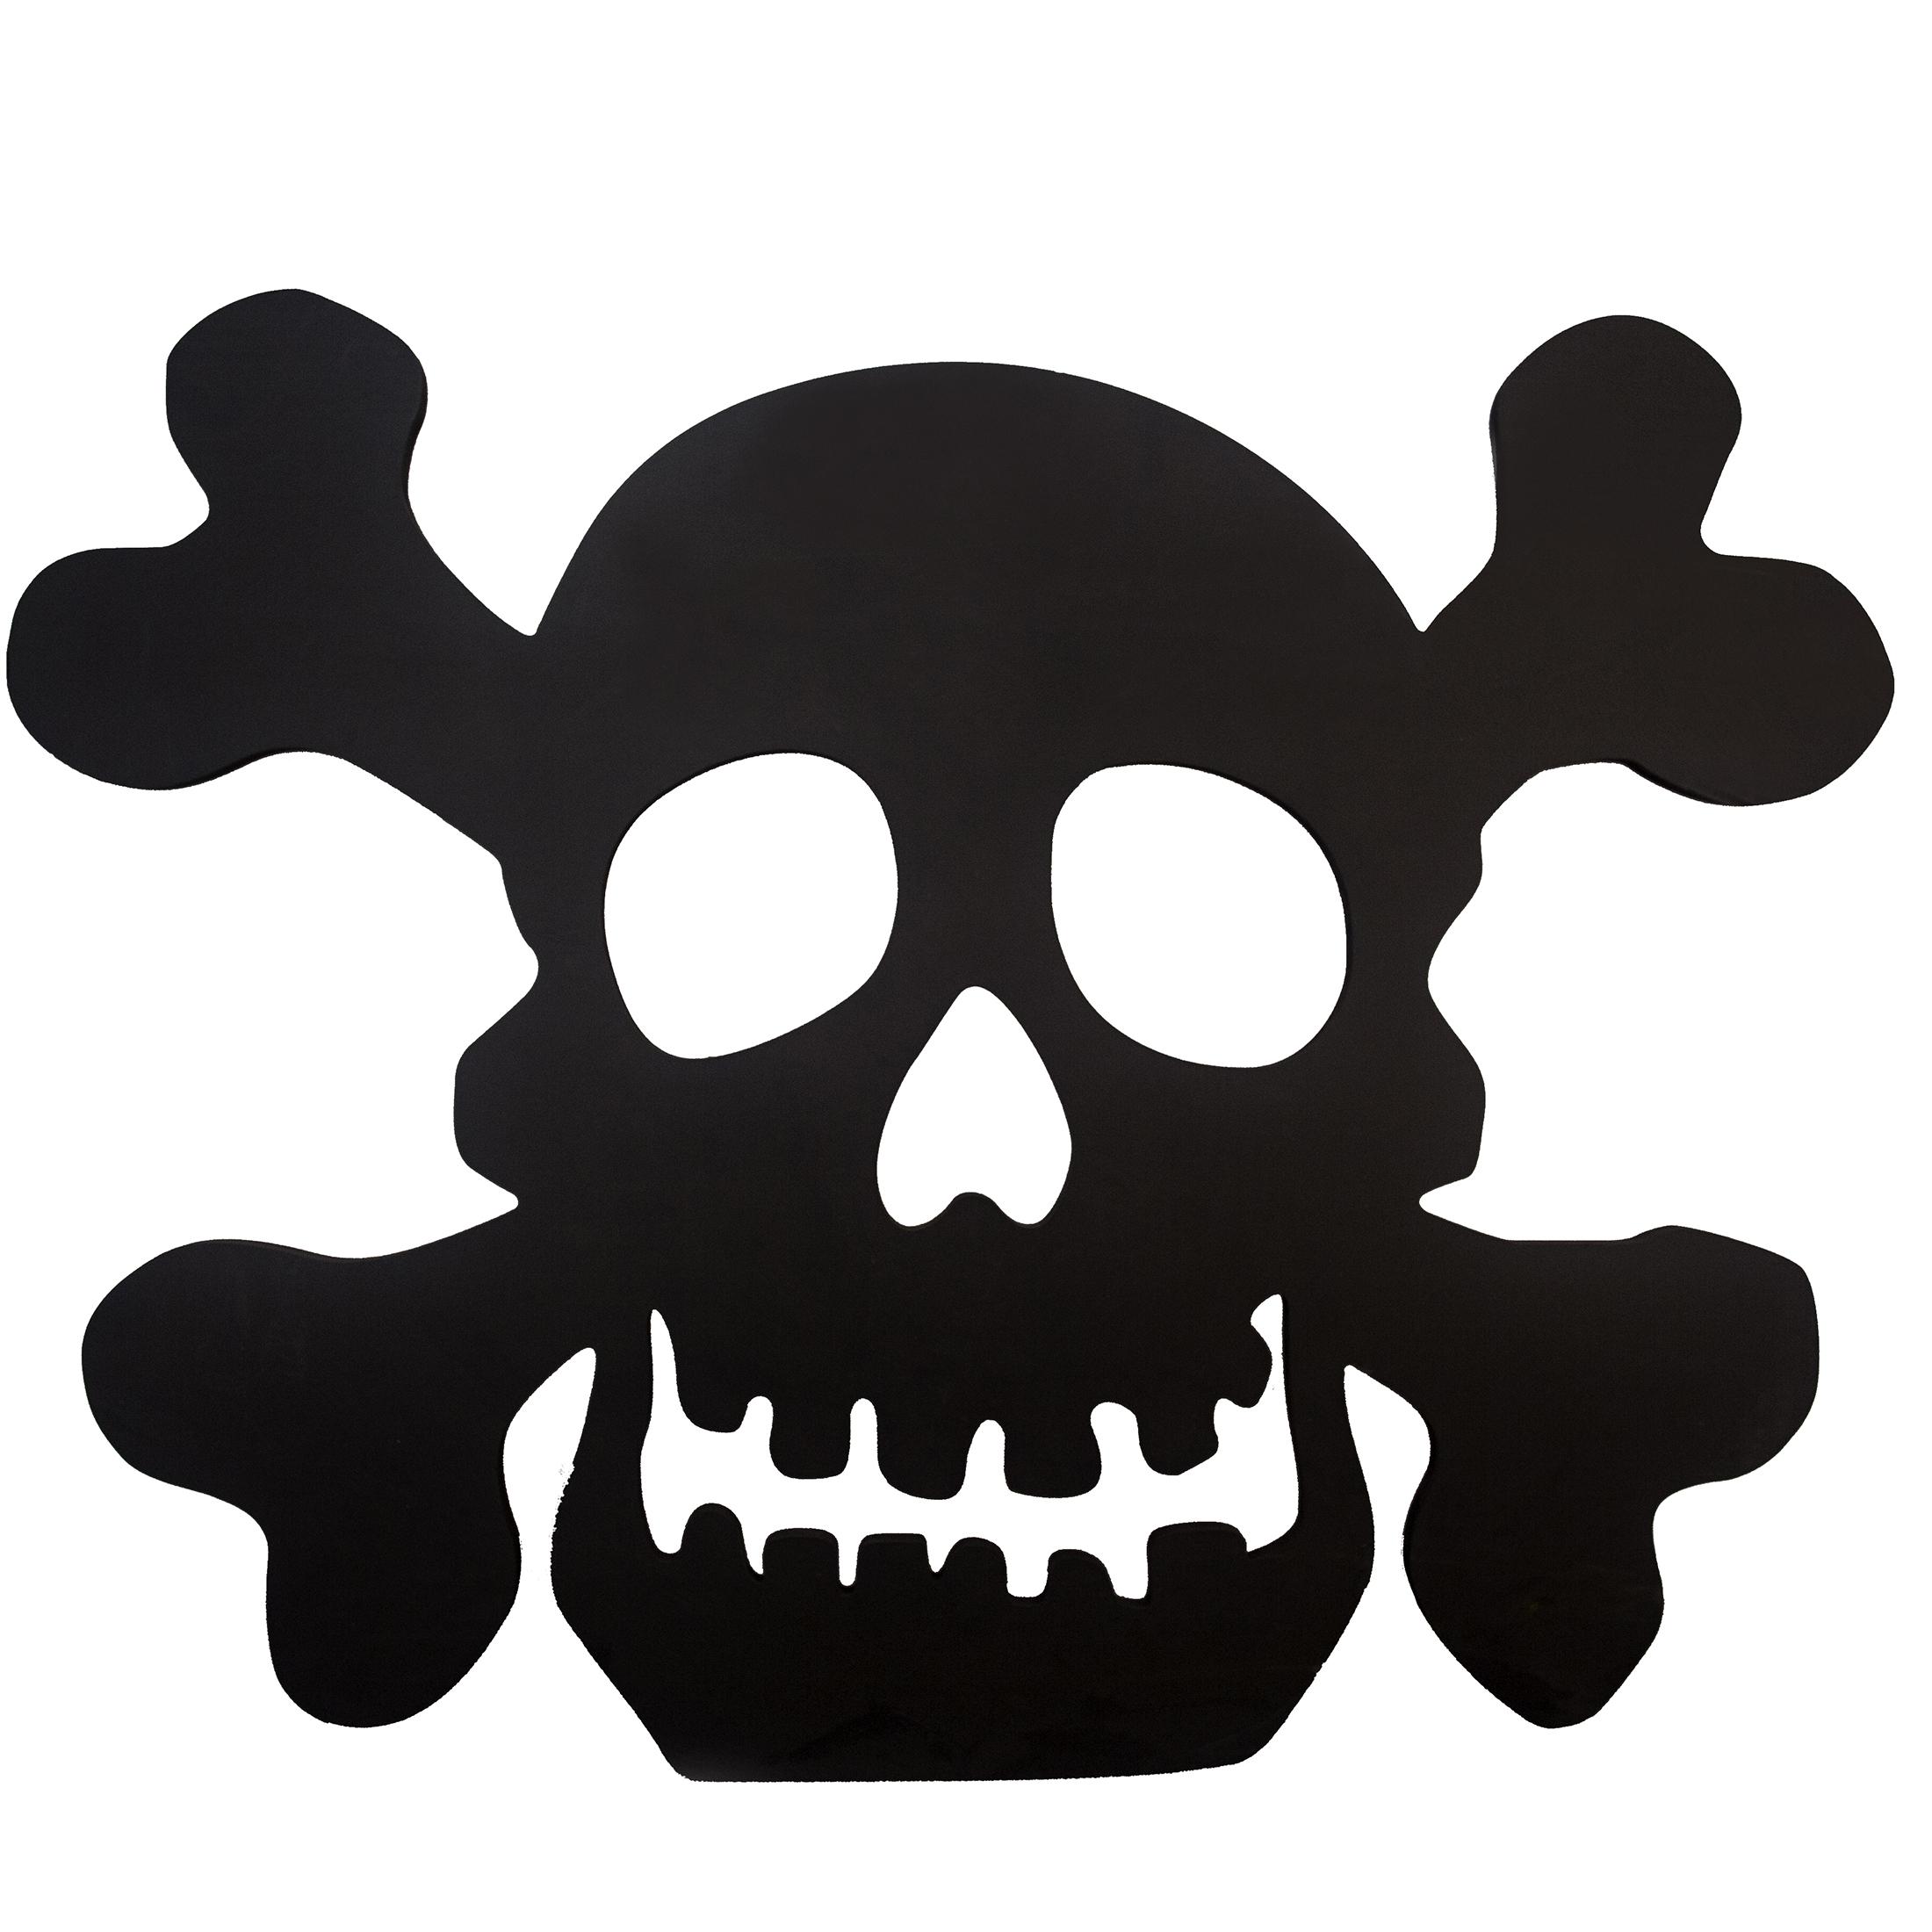 2200x2200 Black Skull Silhouette 23.6x30.3 Lawn Decoration